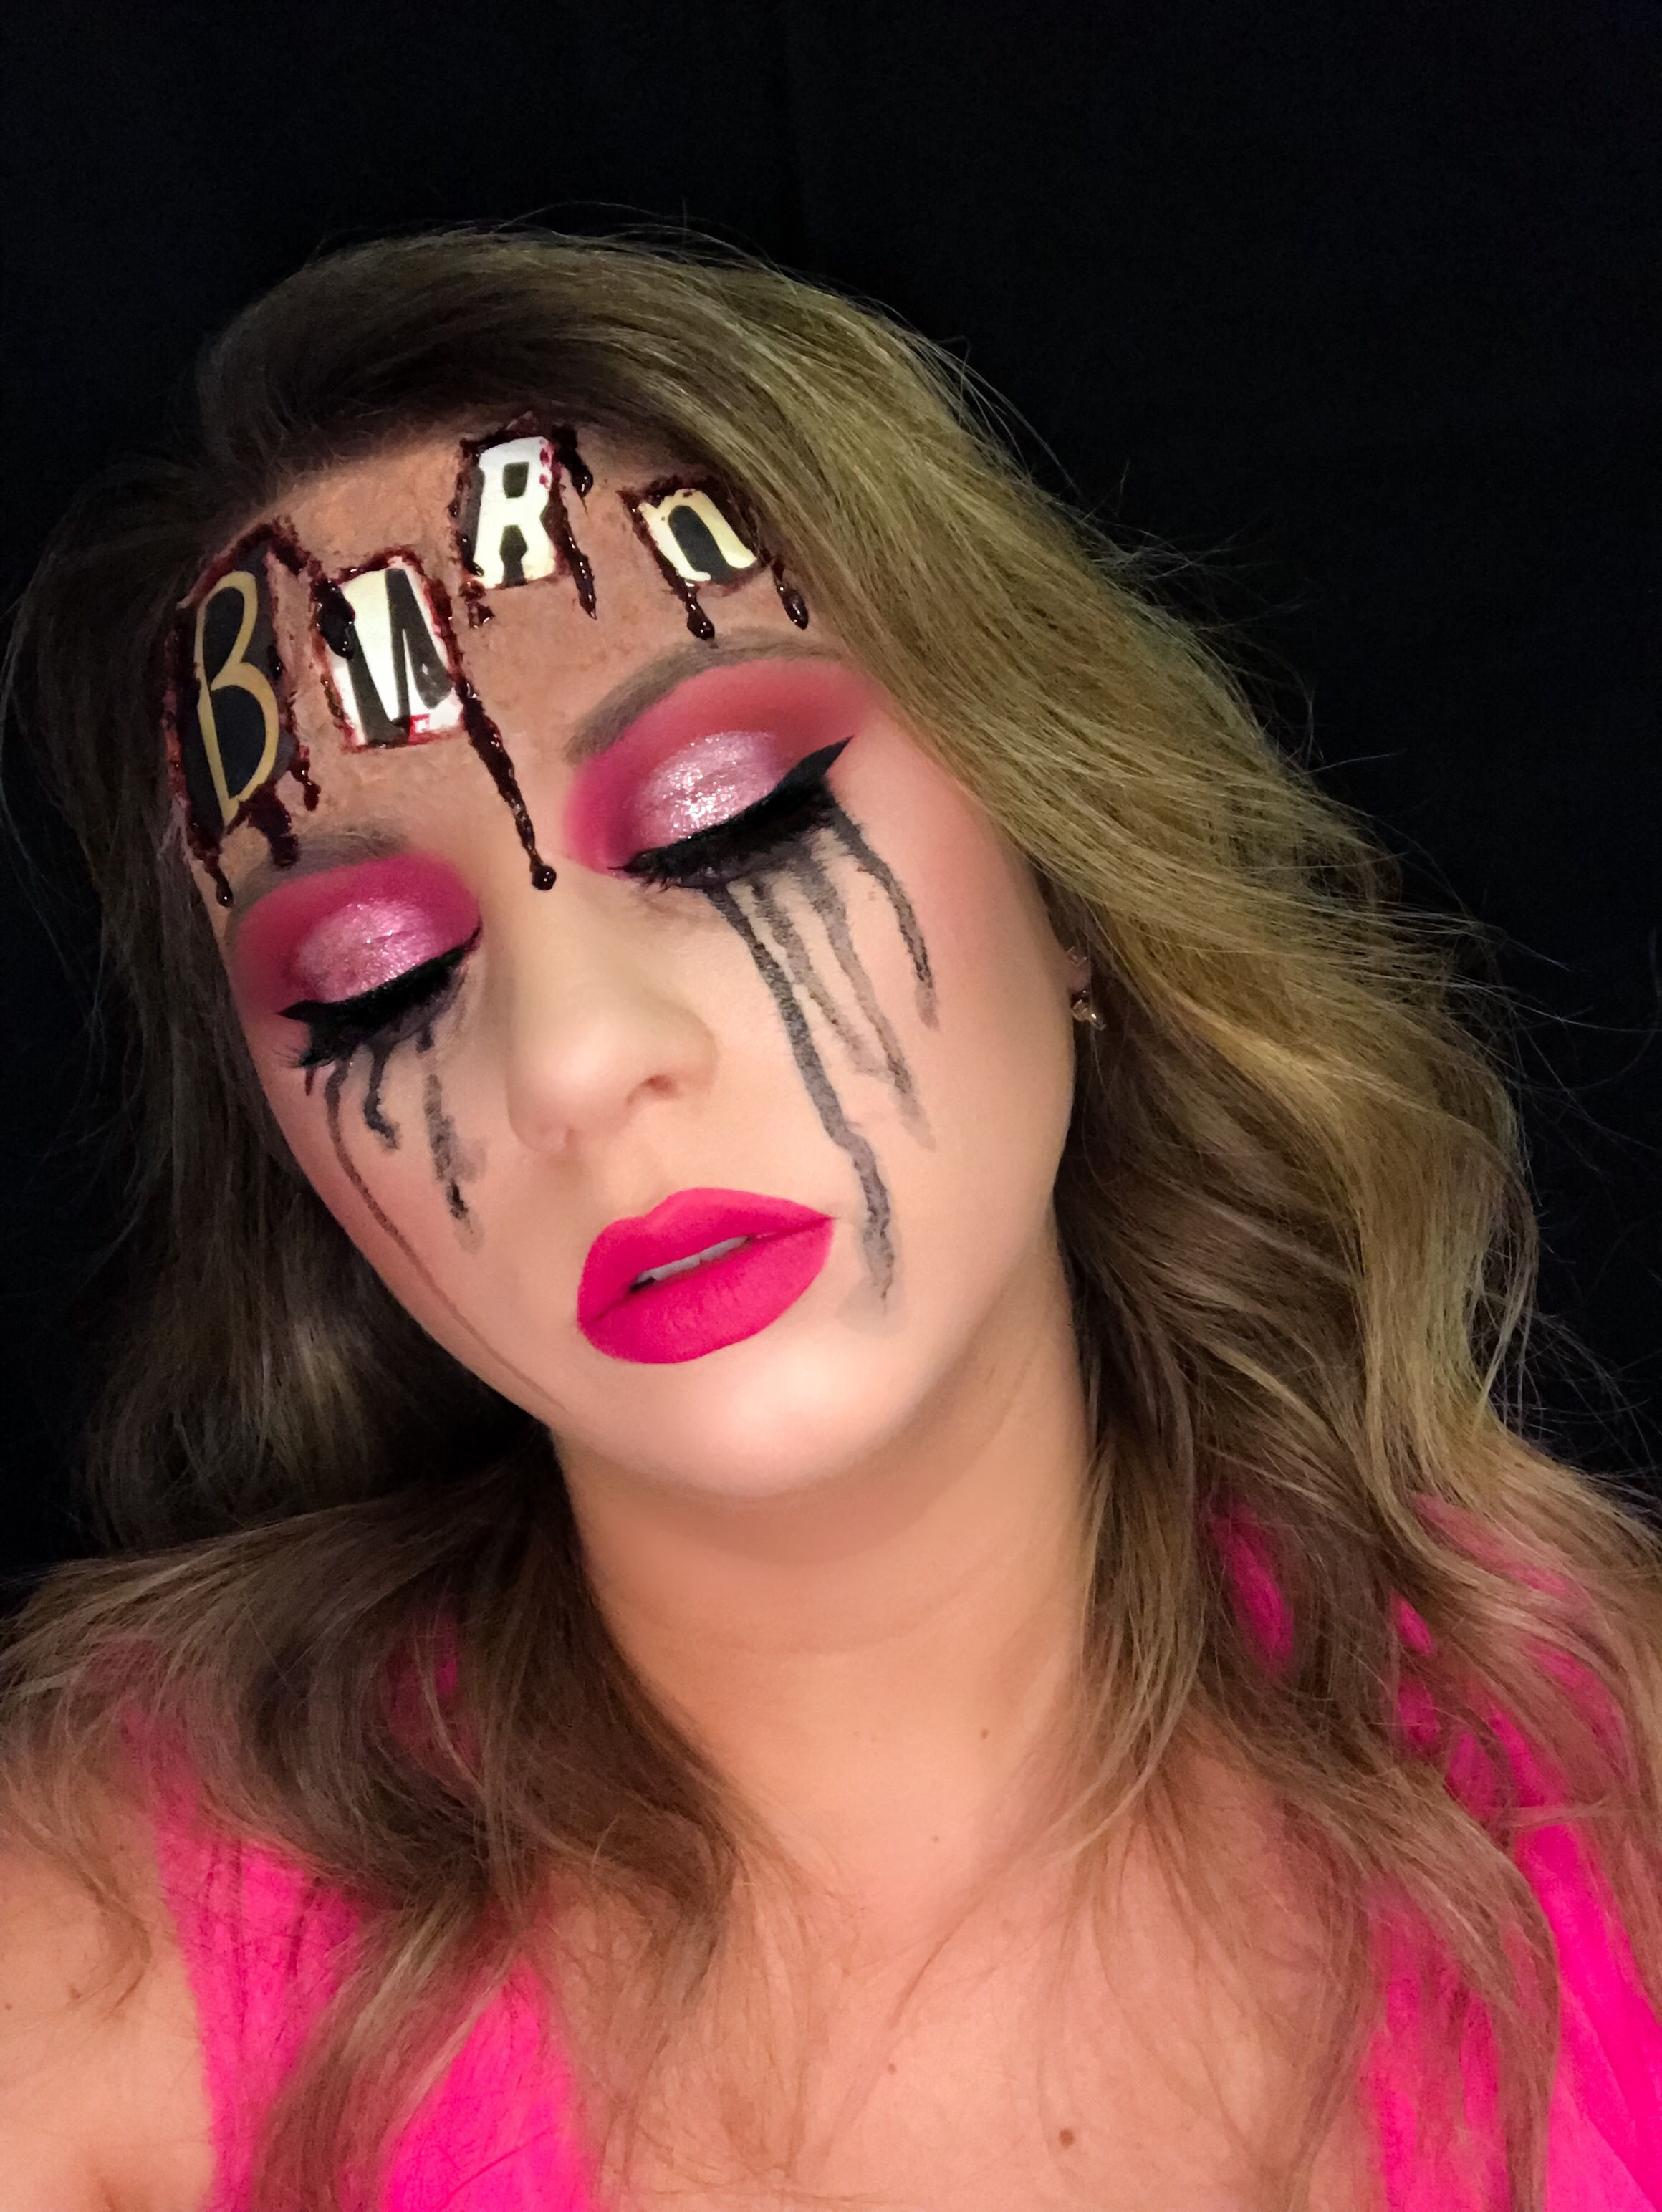 Mean Girls Burn Book Halloween Makeup Halloween Makeup Looks Girl Halloween Makeup Holloween Makeup